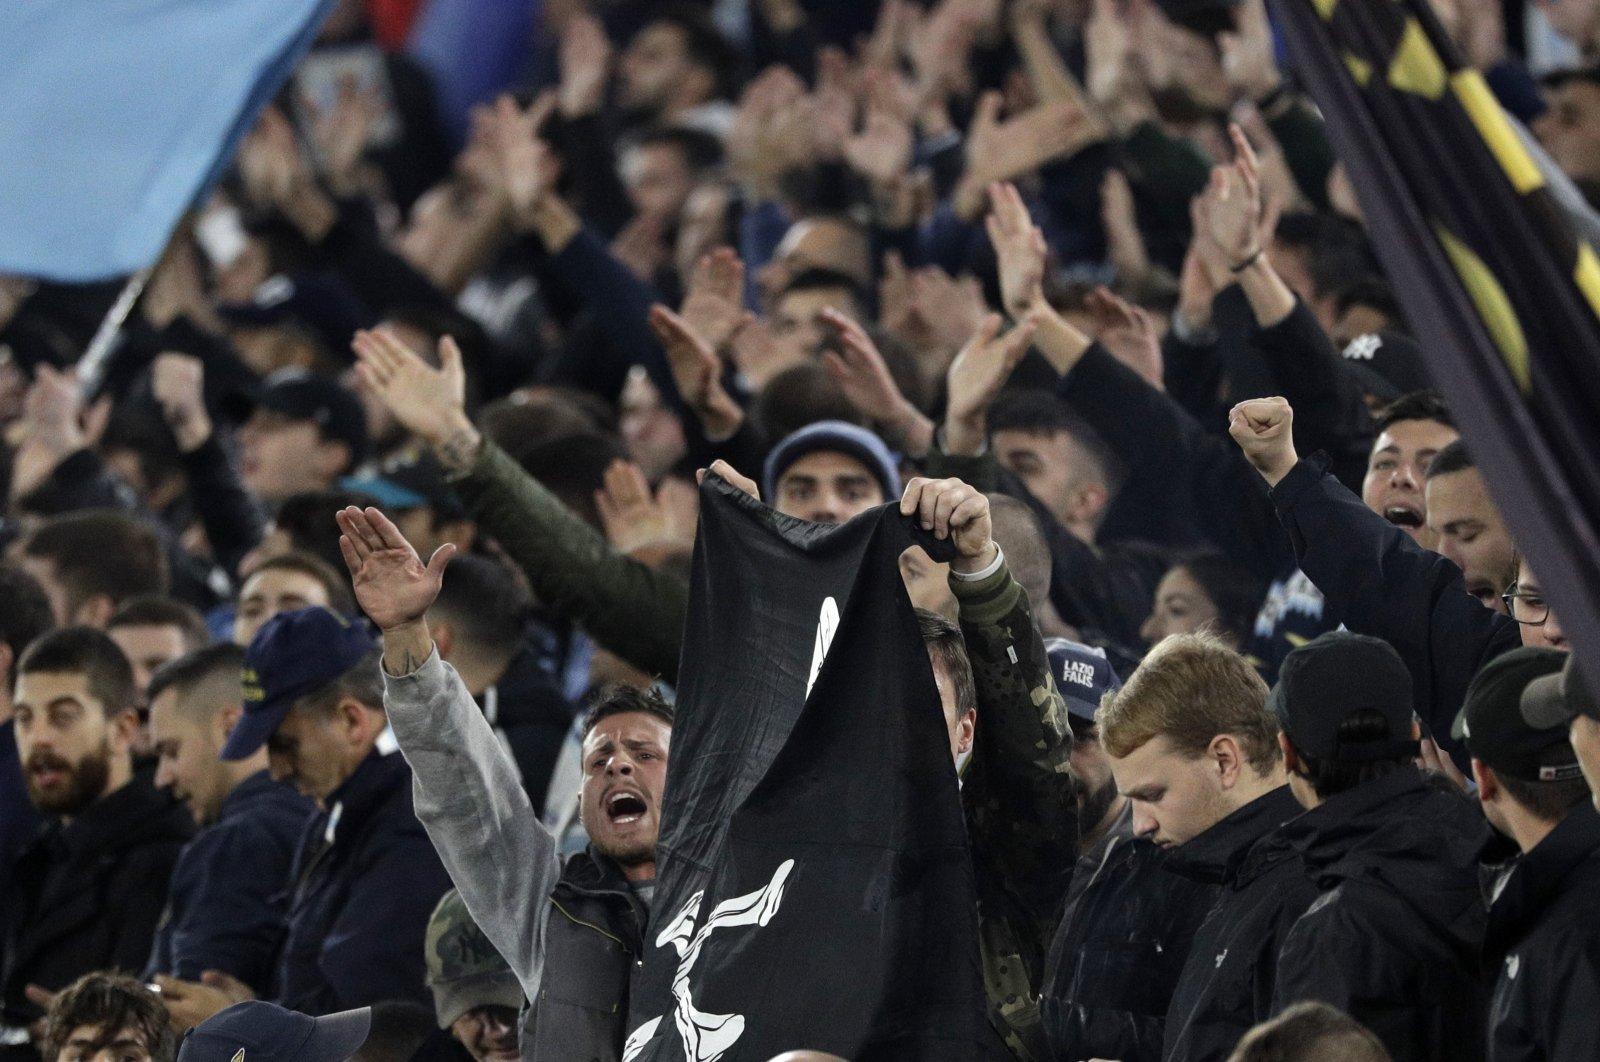 Lazio fans make a fascist salute ahead of an Europa League match between against Celtic, Olympic Stadium, Rome, Italy, Nov. 7, 2019 (AP Photo)